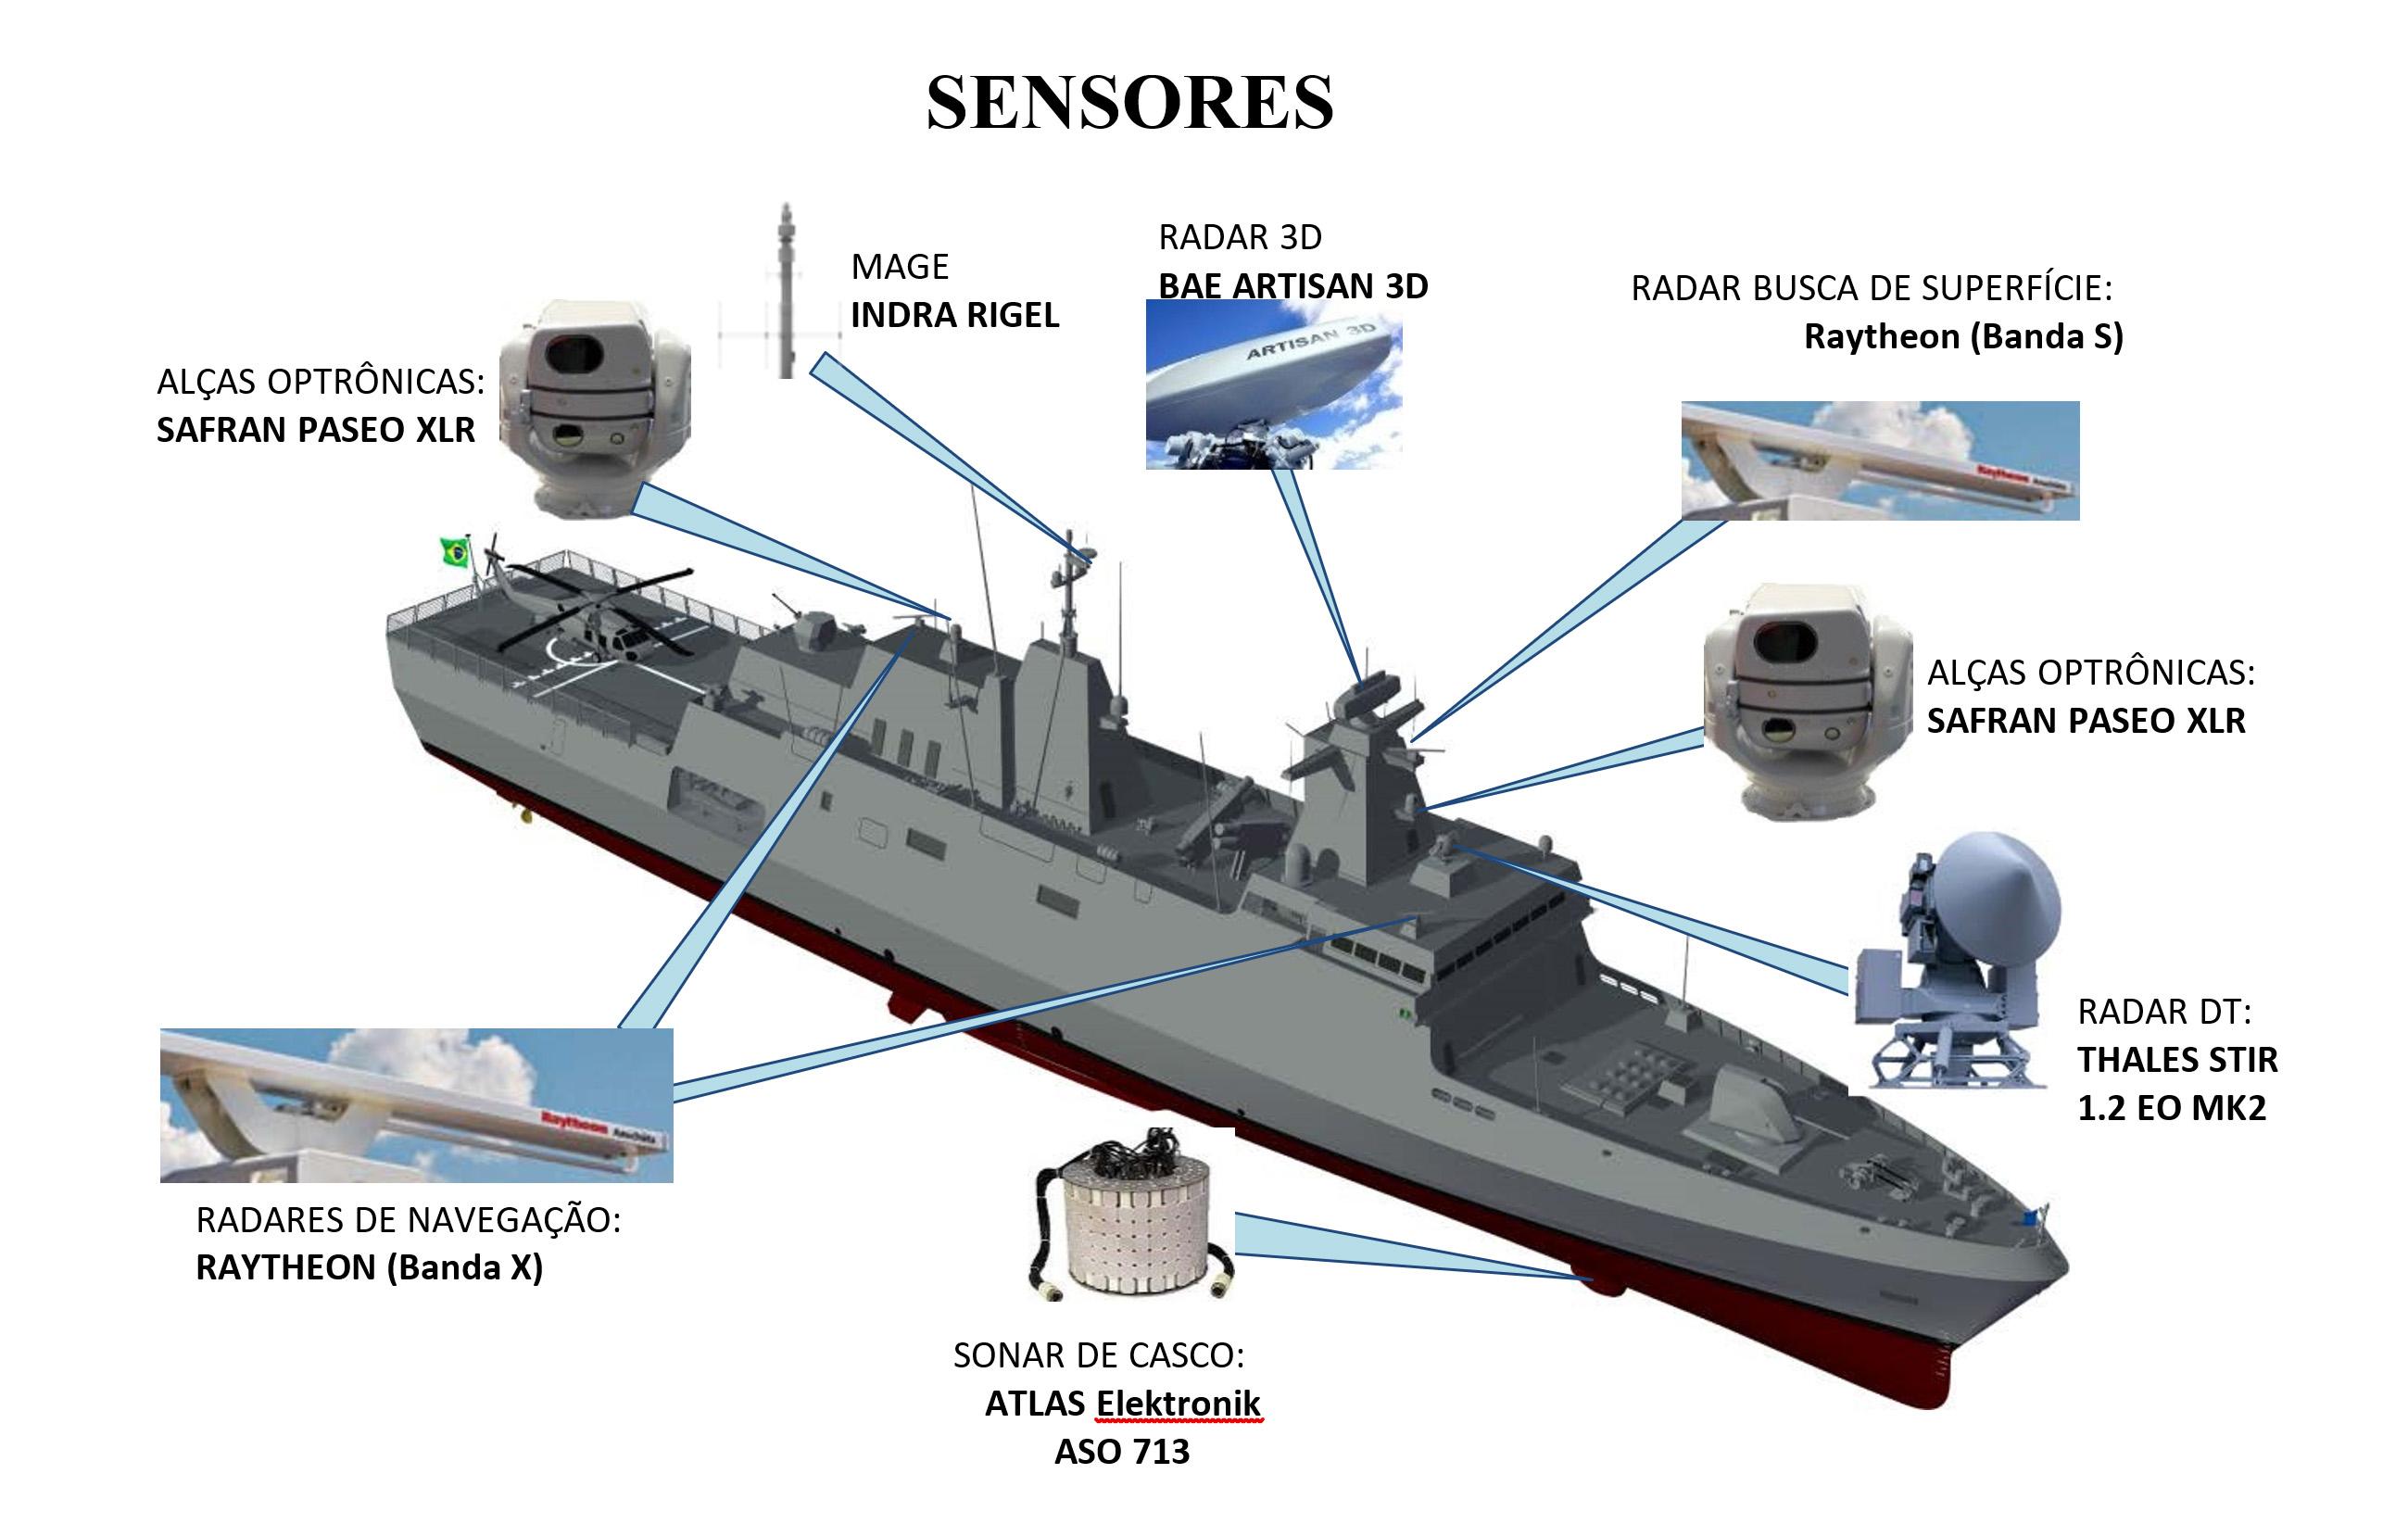 Corveta-classe-Tamandaré-sensores